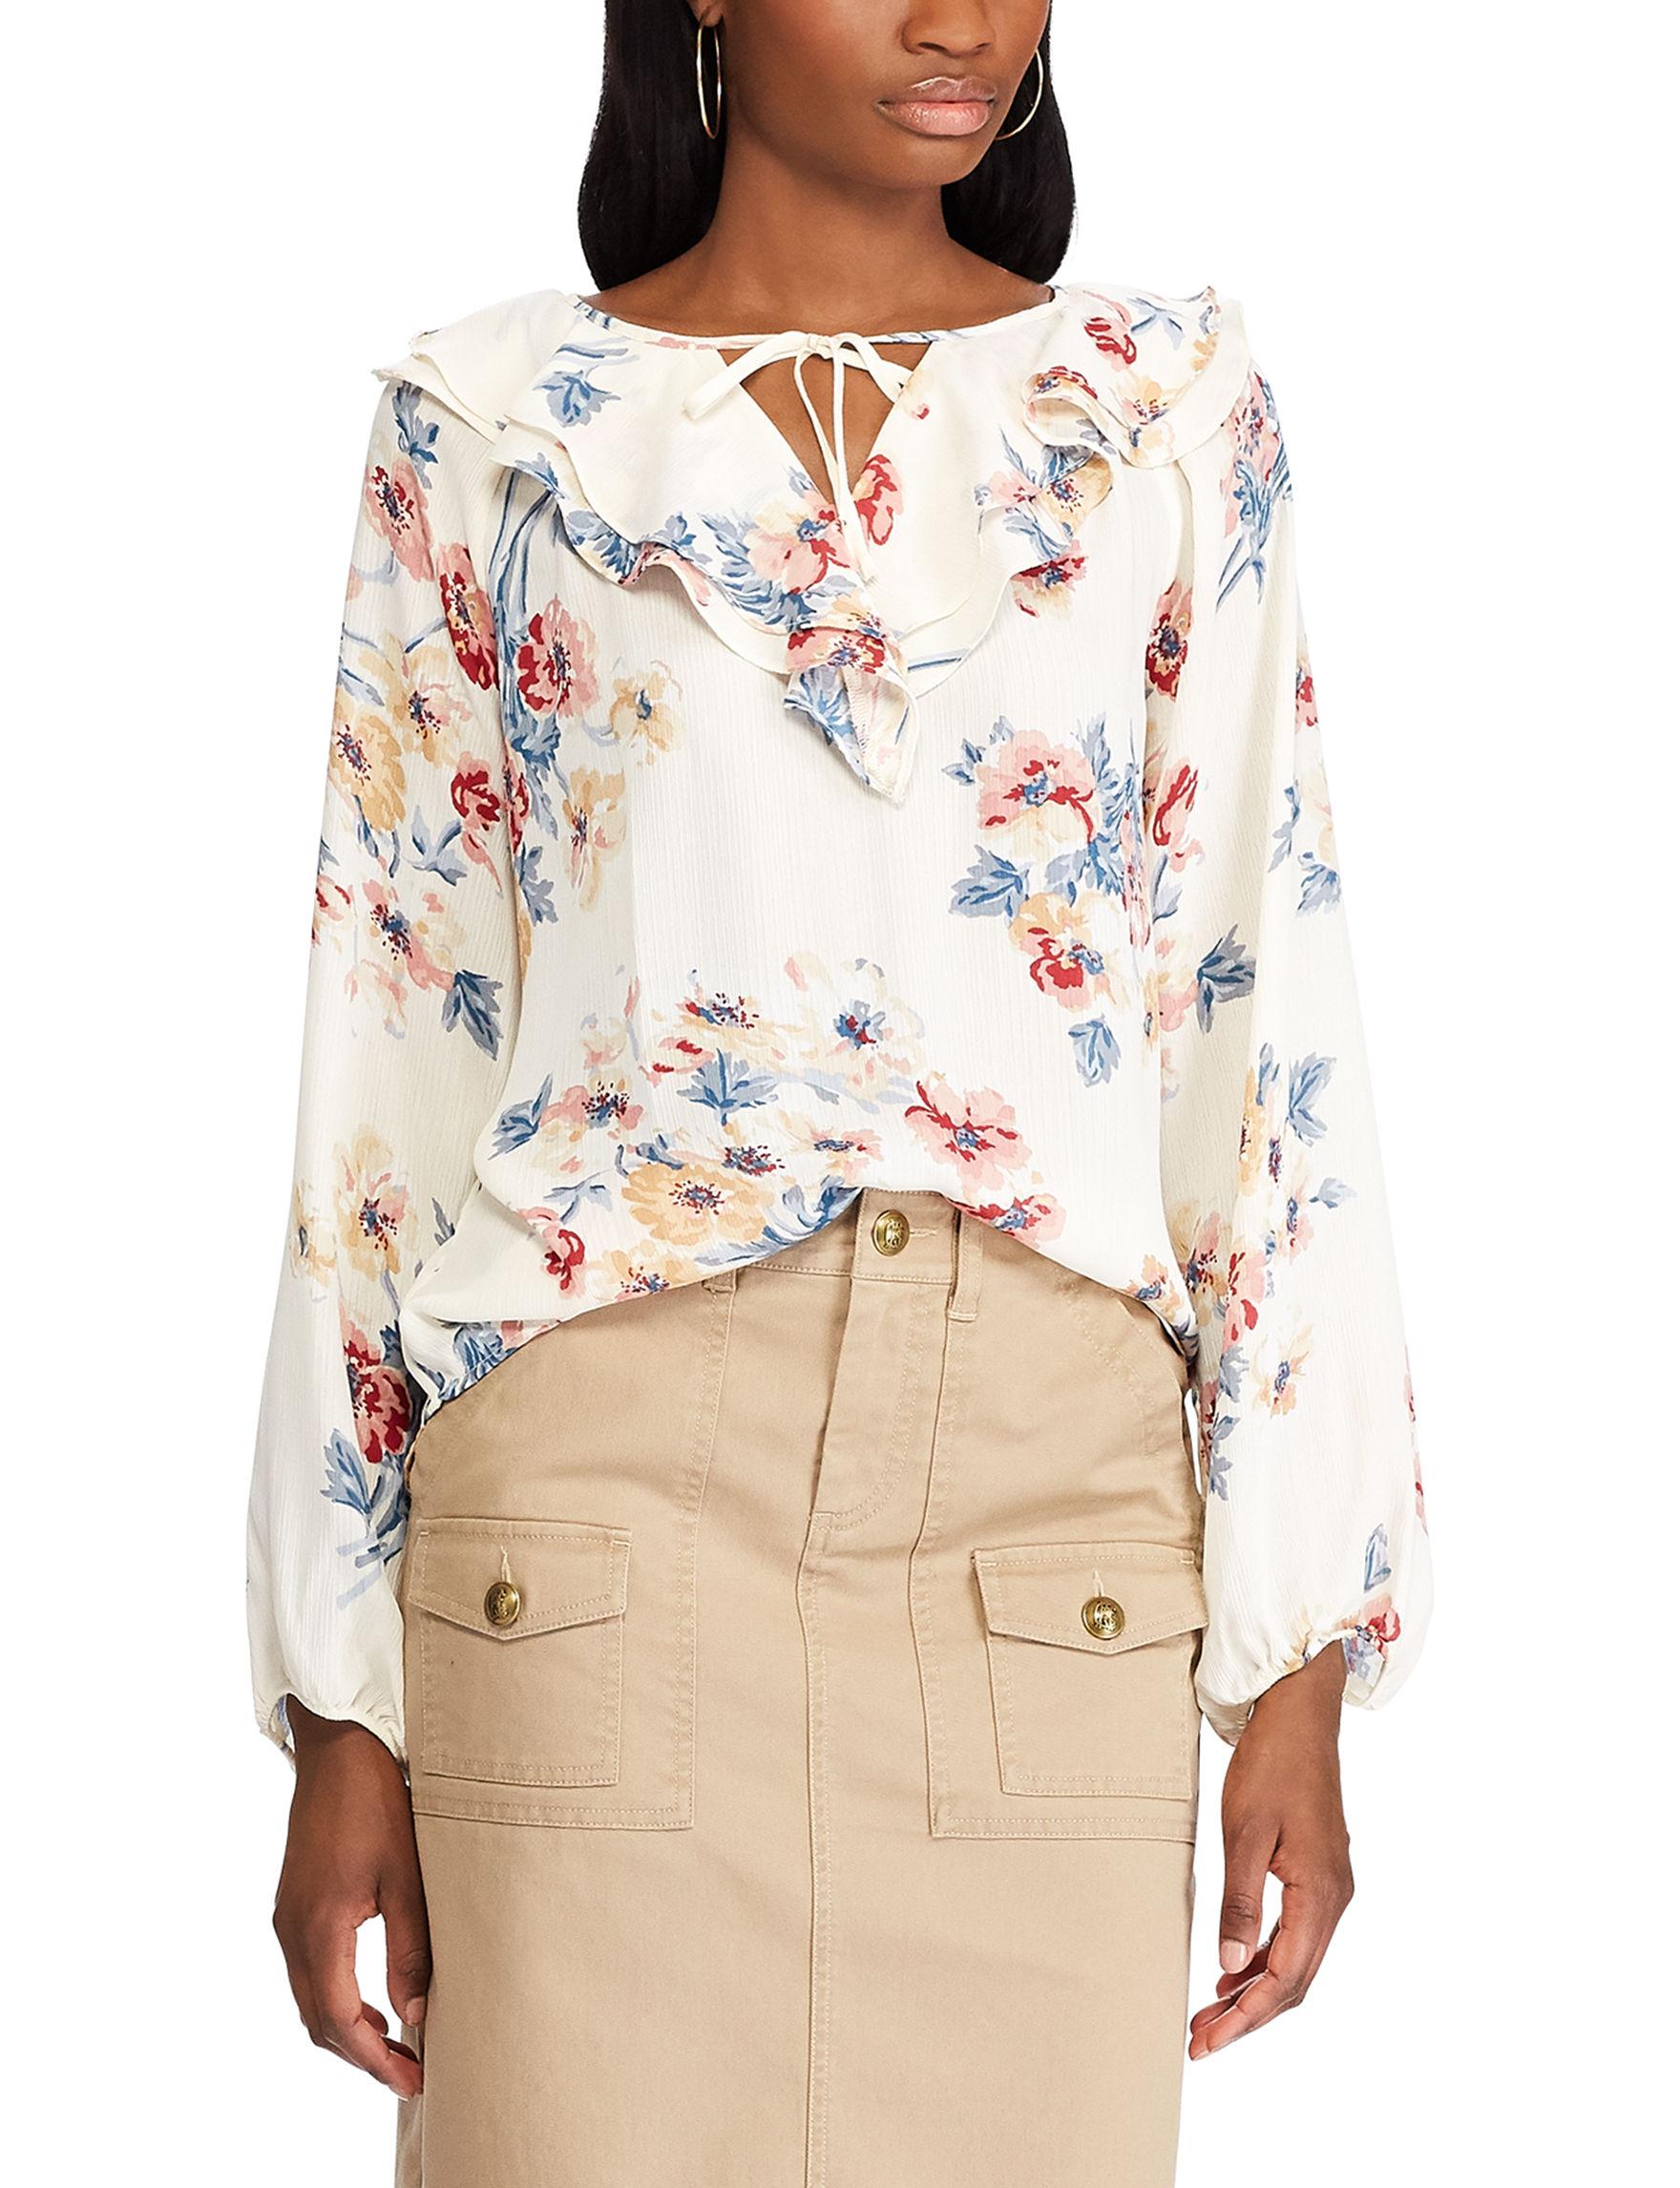 Chaps Cream Floral Shirts & Blouses